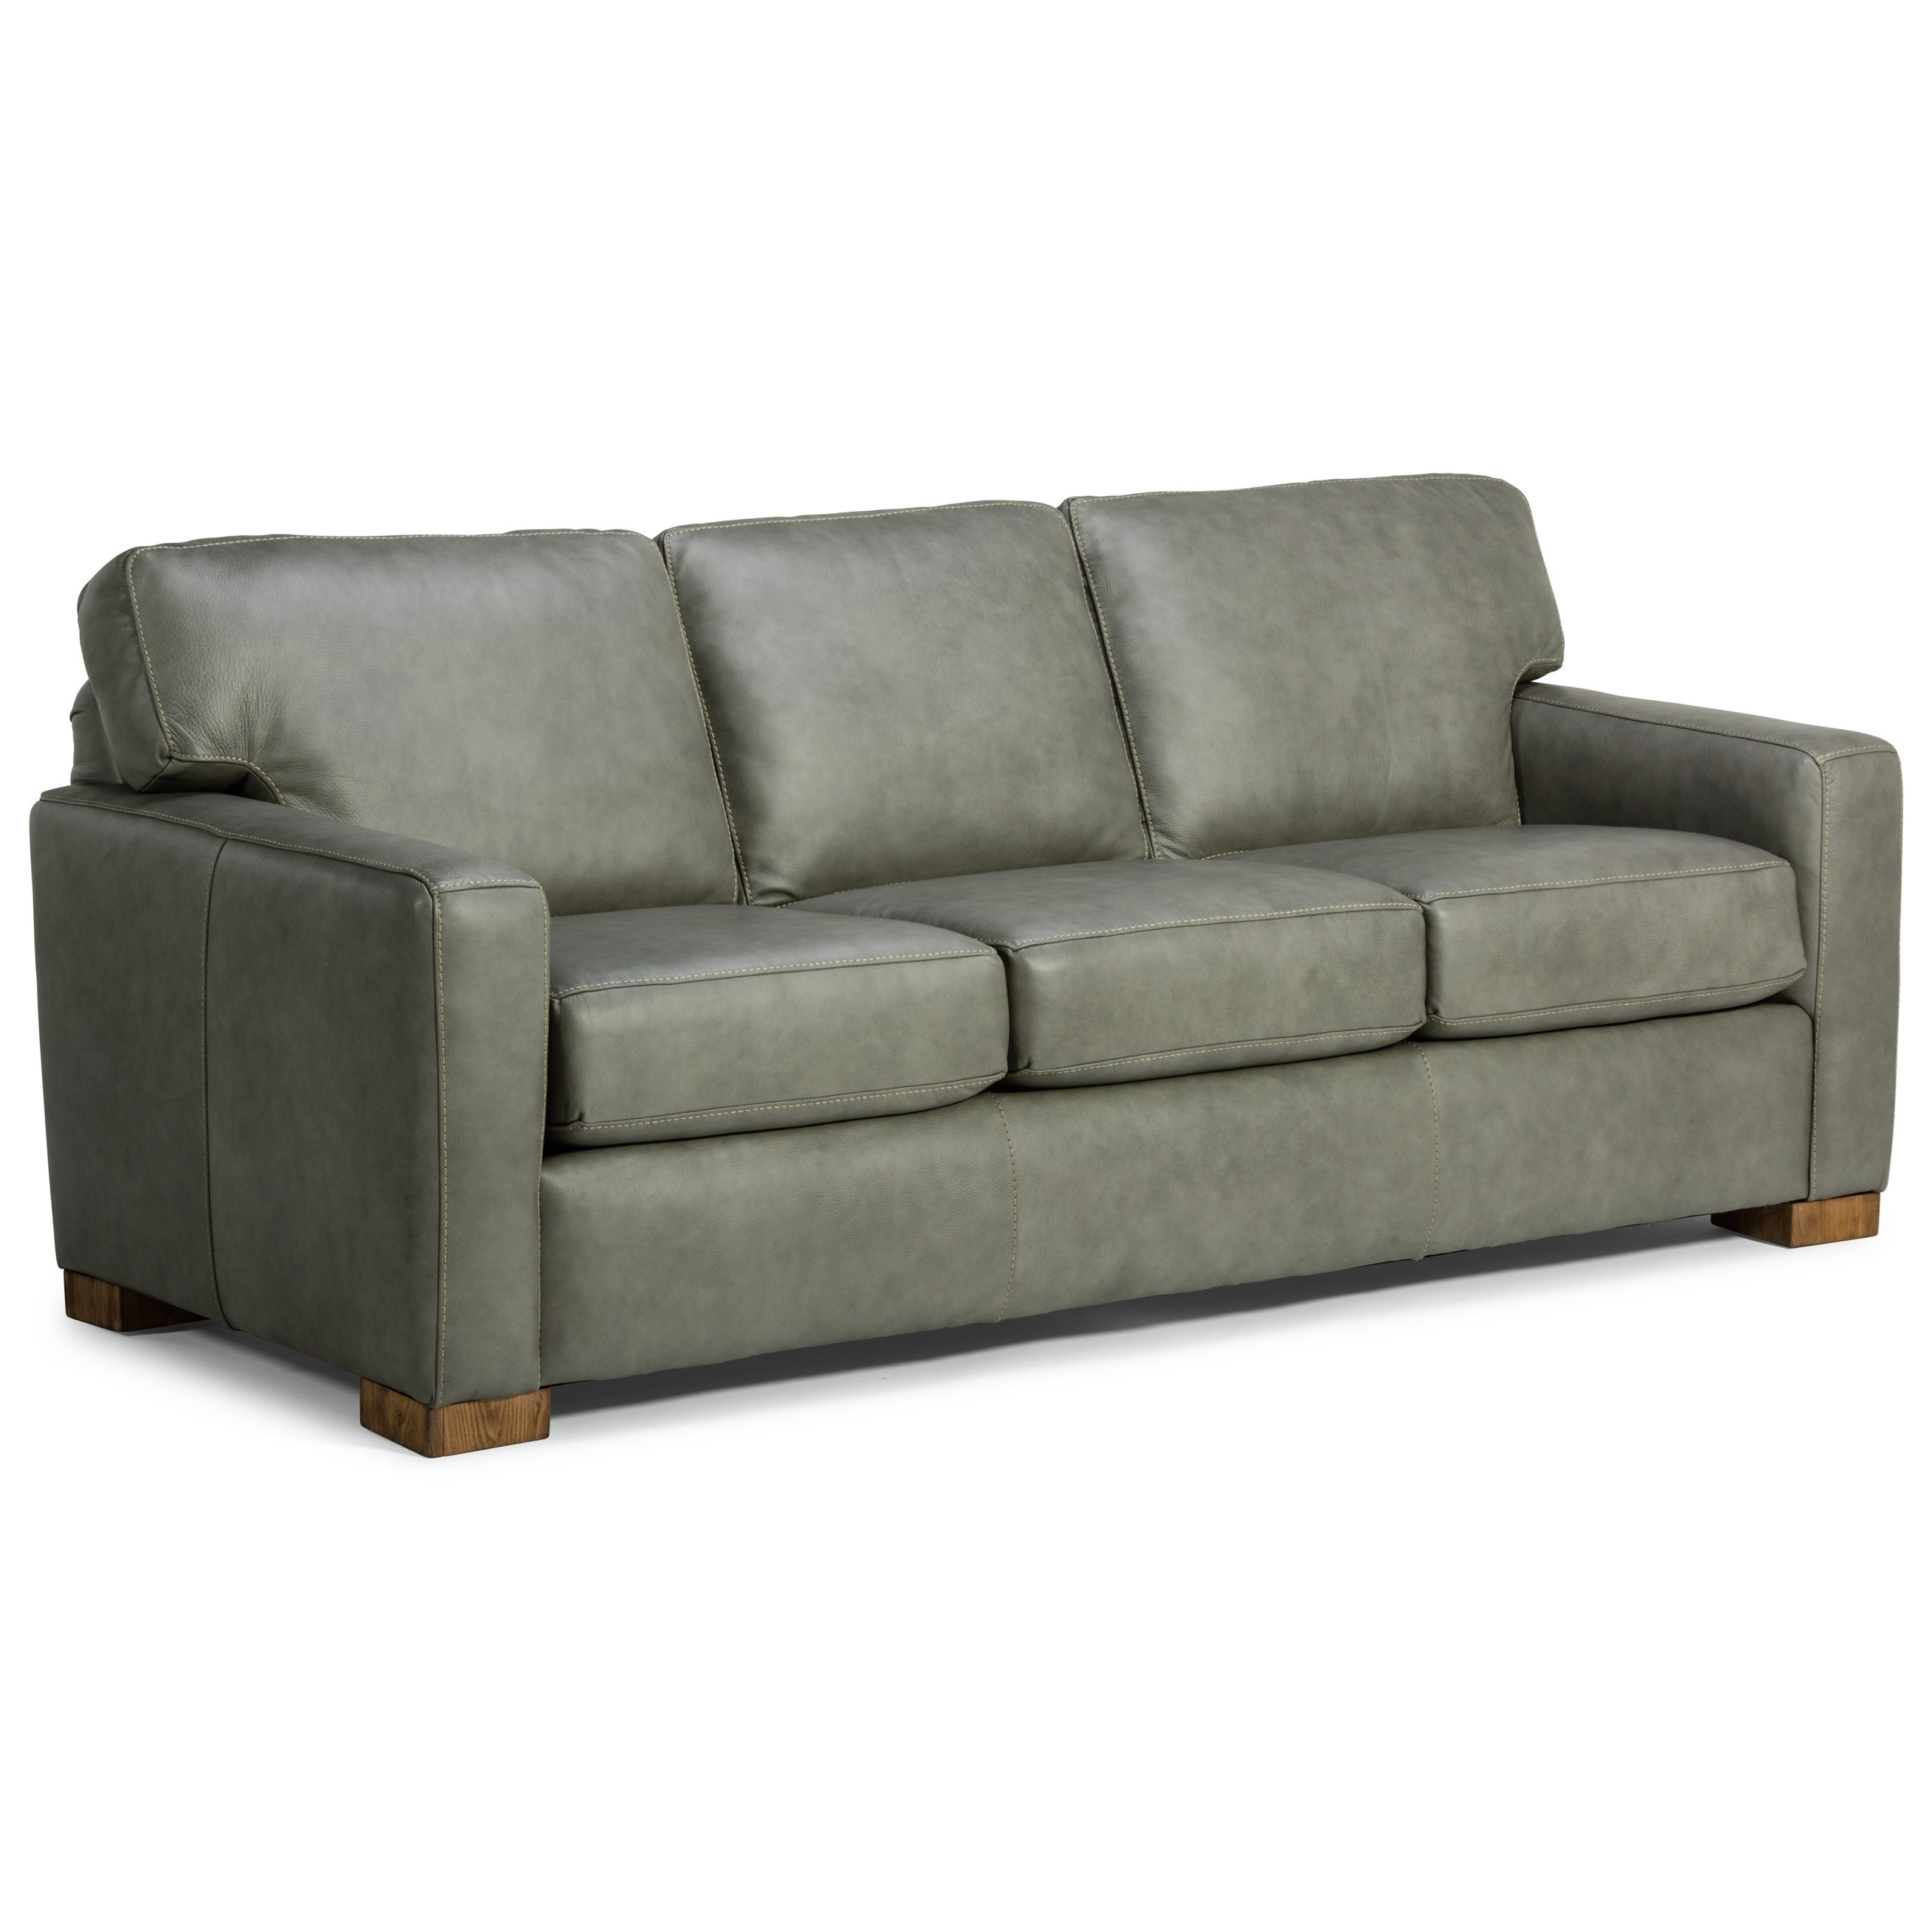 Bryant Sofa by Flexsteel at Crowley Furniture & Mattress